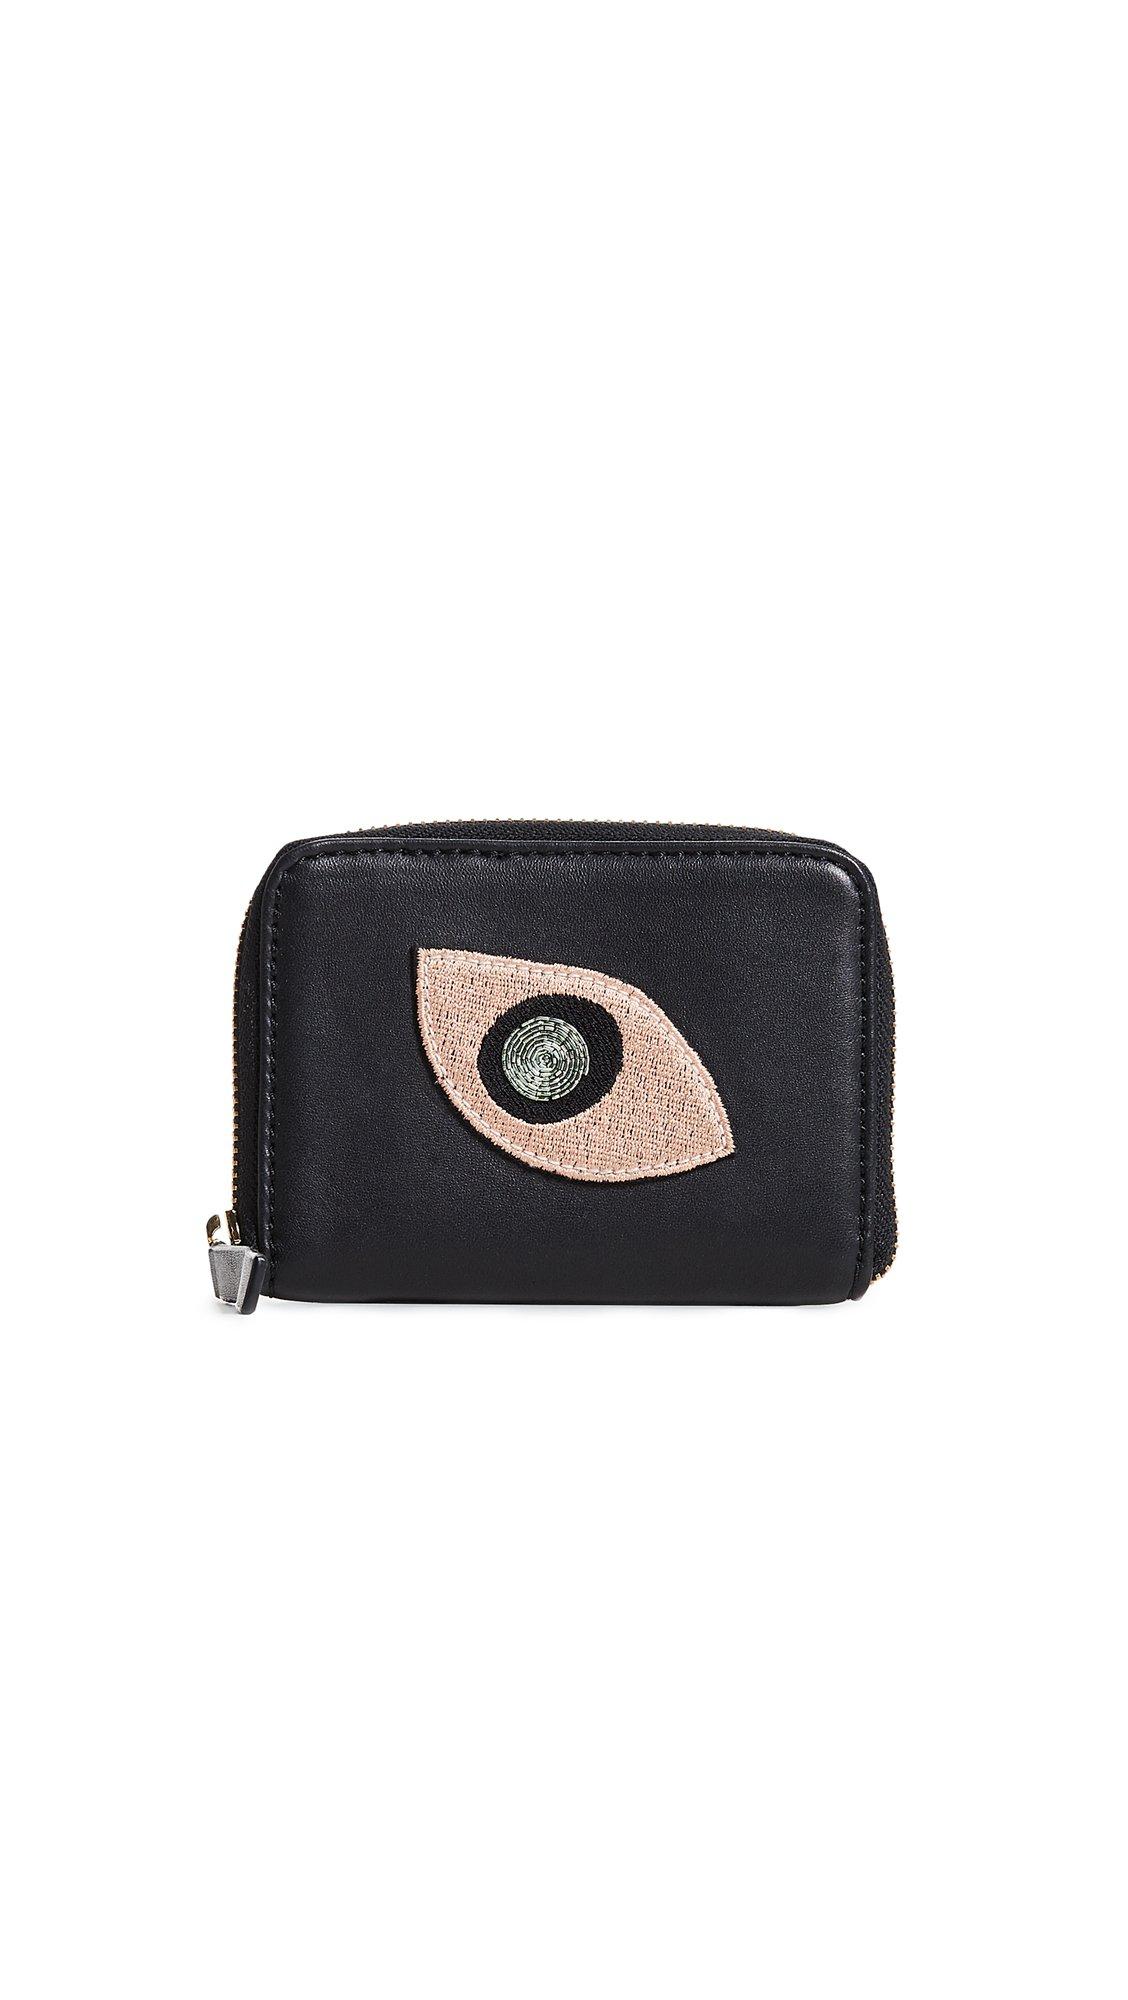 Lizzie Fortunato Women's Abstract Eye Zip Coin Purse, Black, One Size